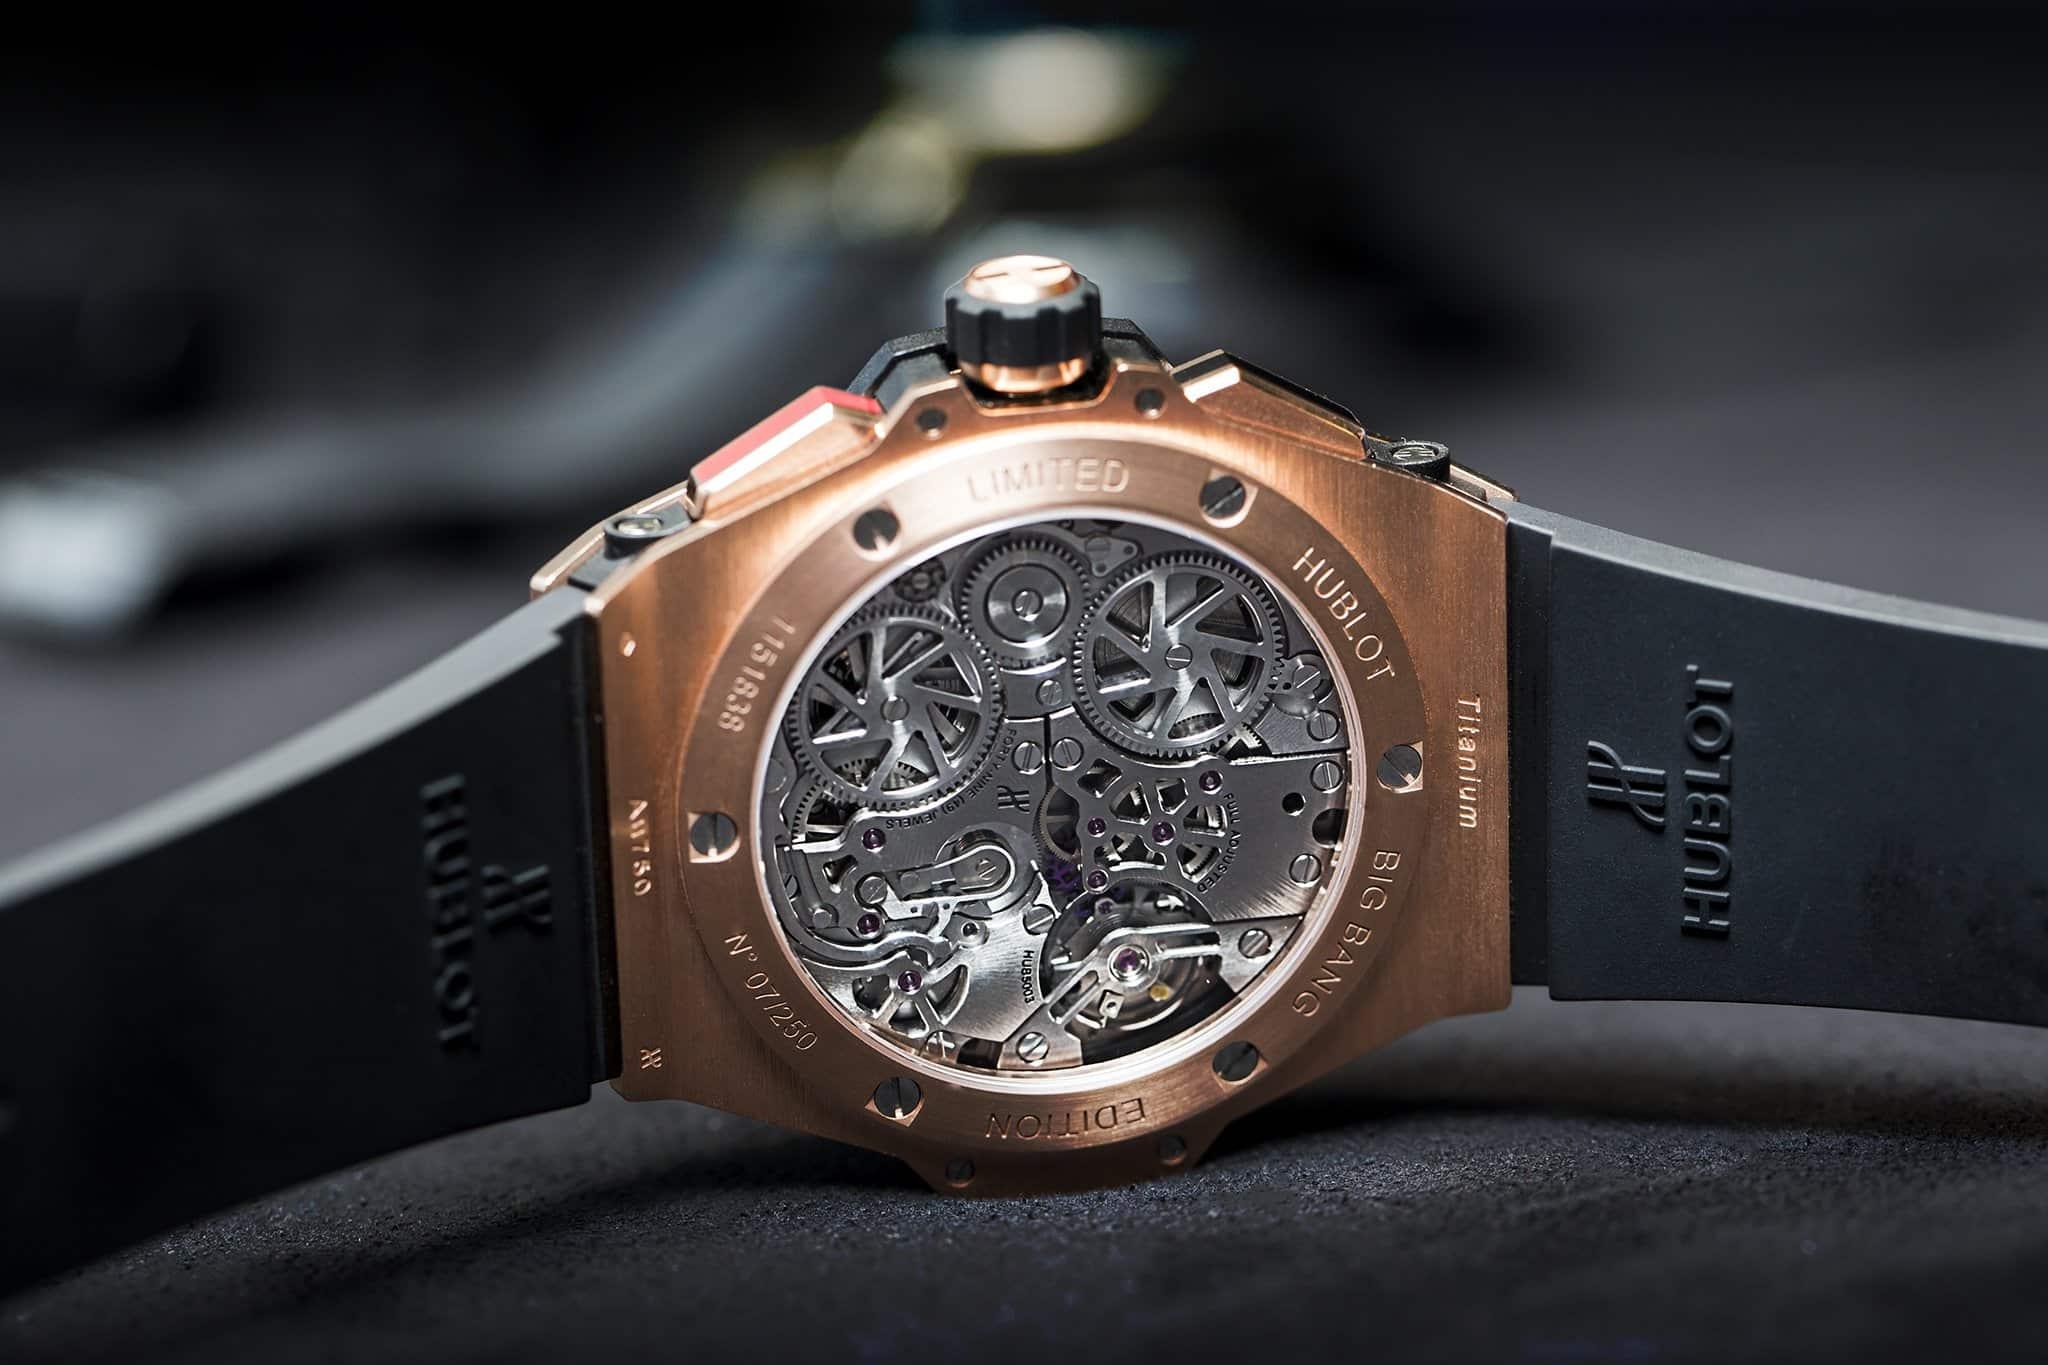 Hublot-Big-Bang-Alarm-Repeater-Watch-in-King-Gold-Back1